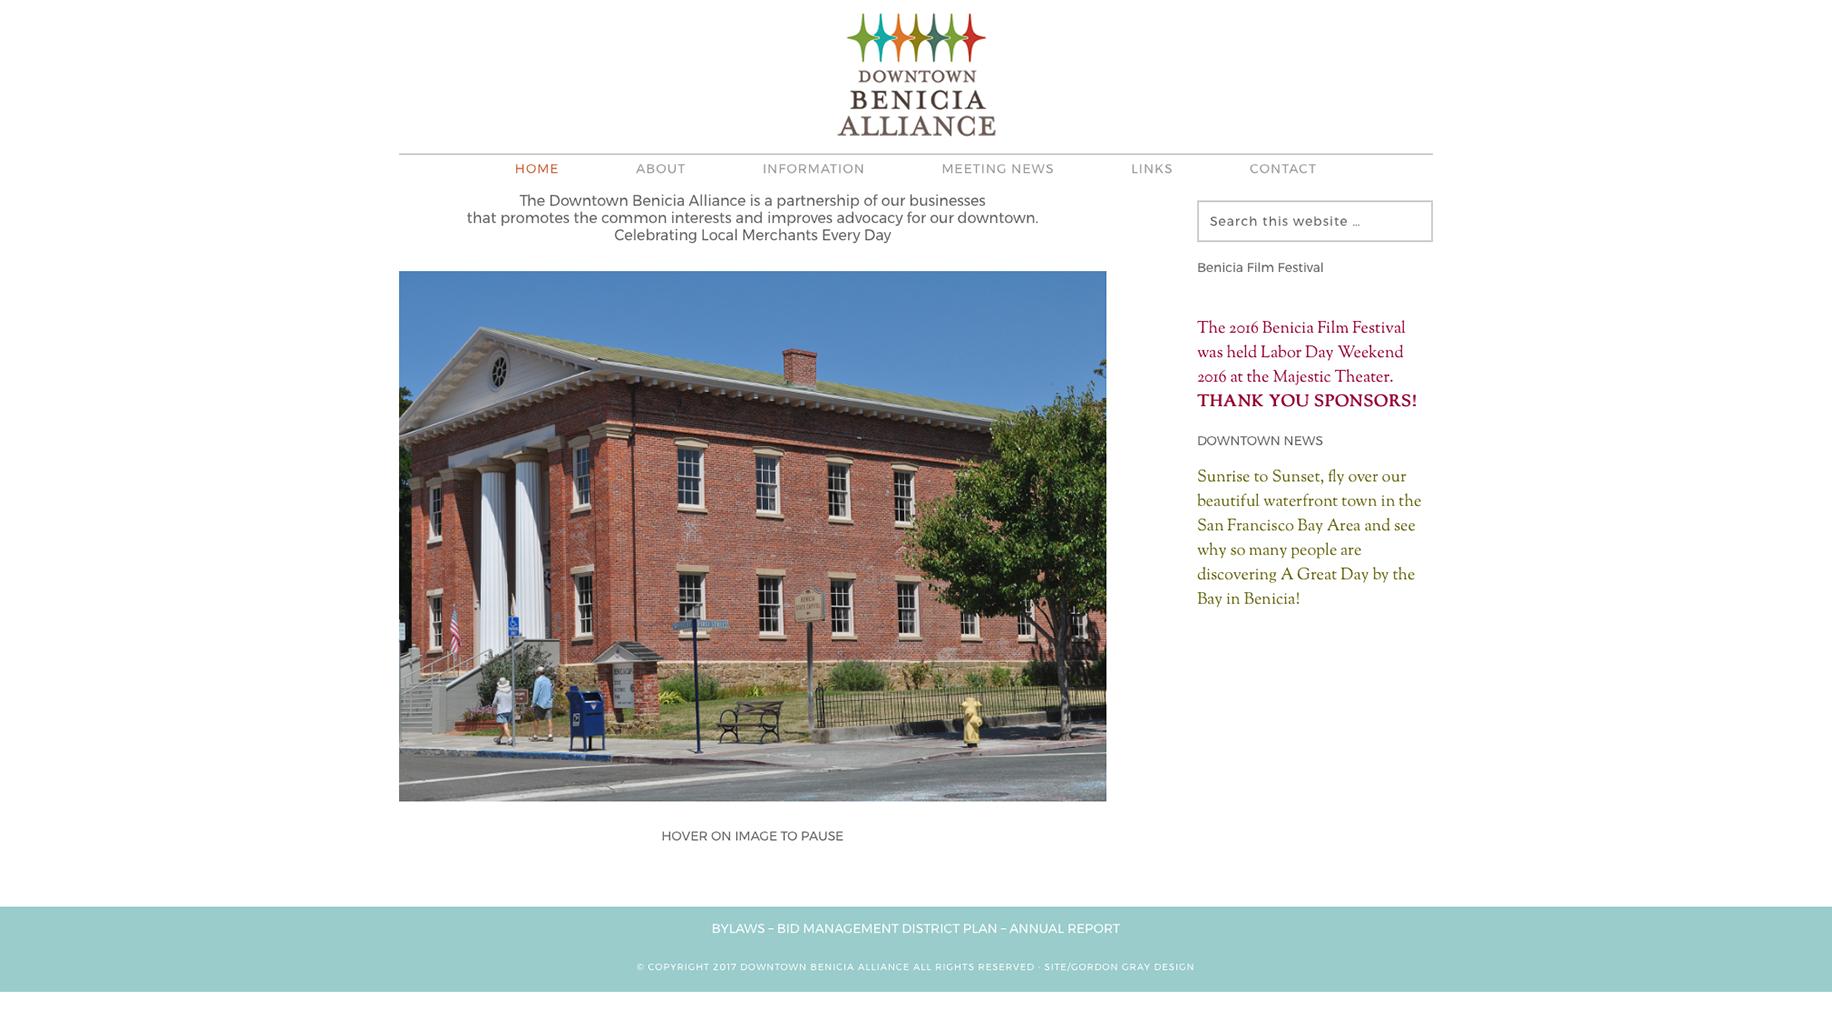 Downtown Benicia Alliance Website